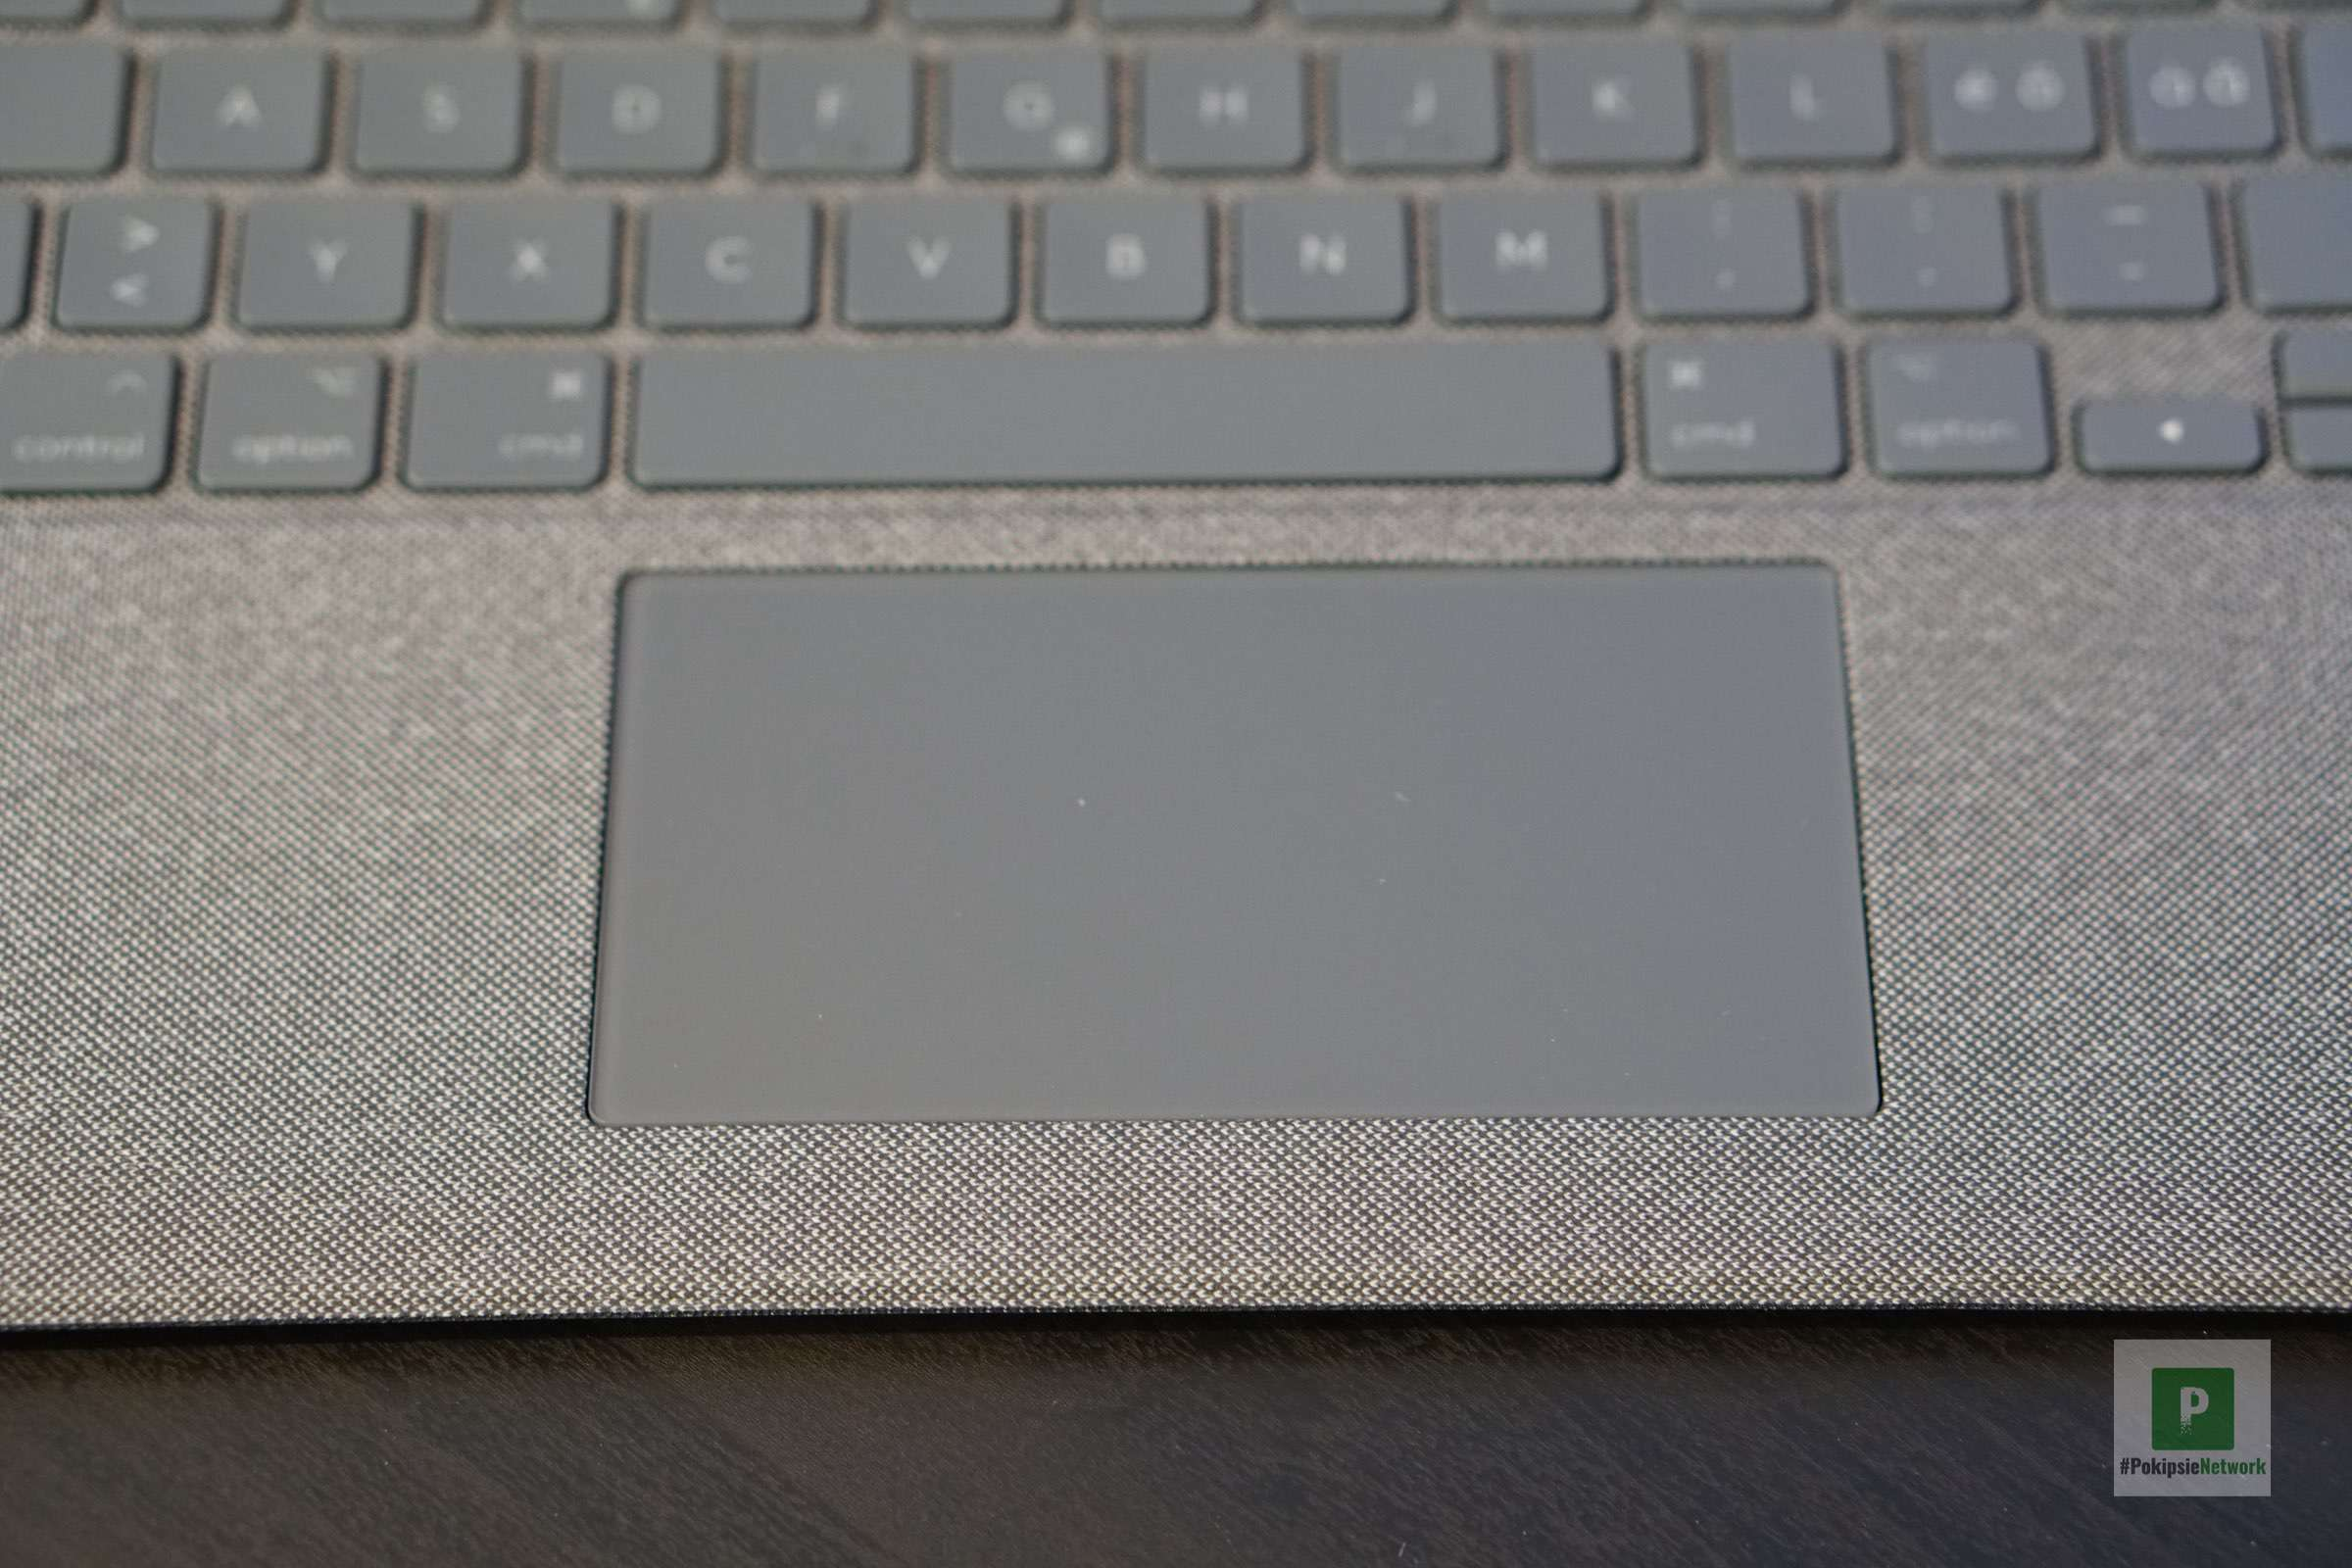 Das Trackpad